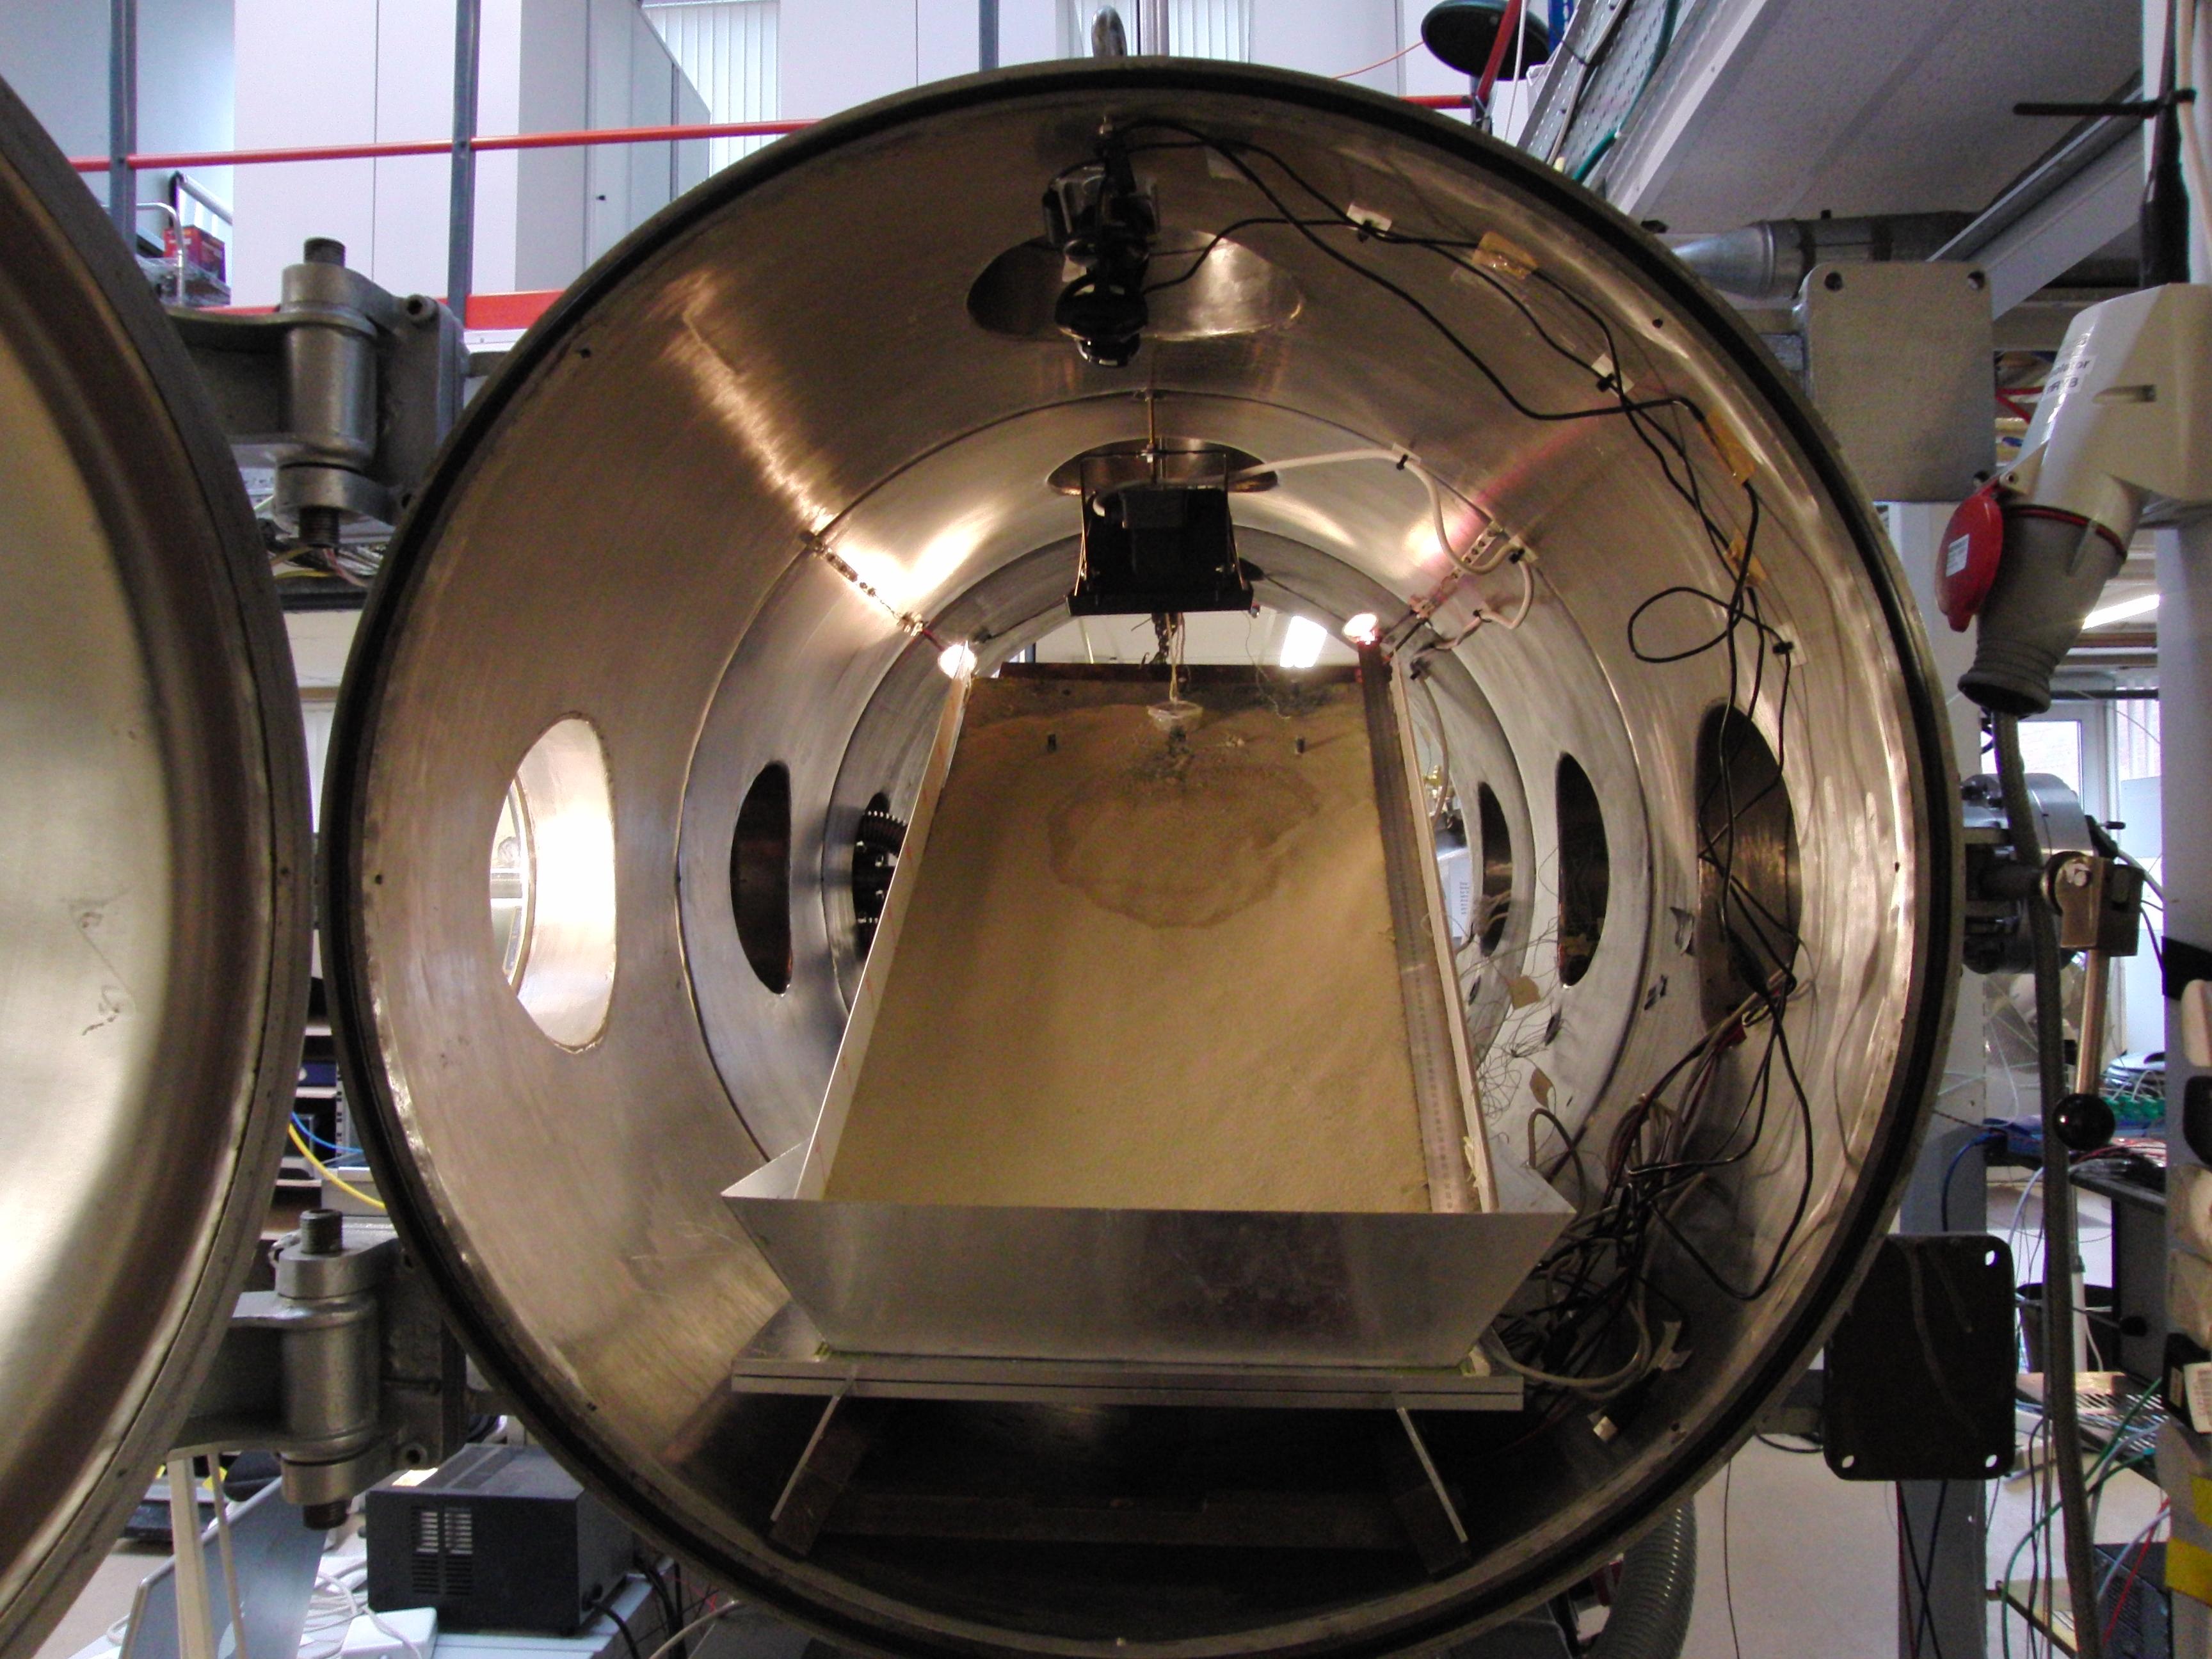 Mars simulation chamber